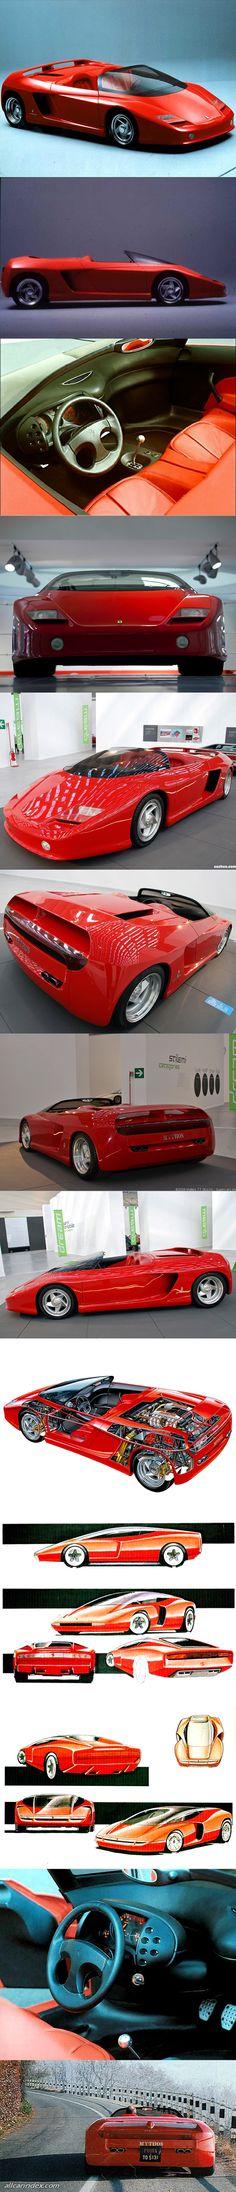 1989 Ferrari Mythos / Italy / Pininfarina / Lorenzo Ramaciotti / concept / red / Testarossa based